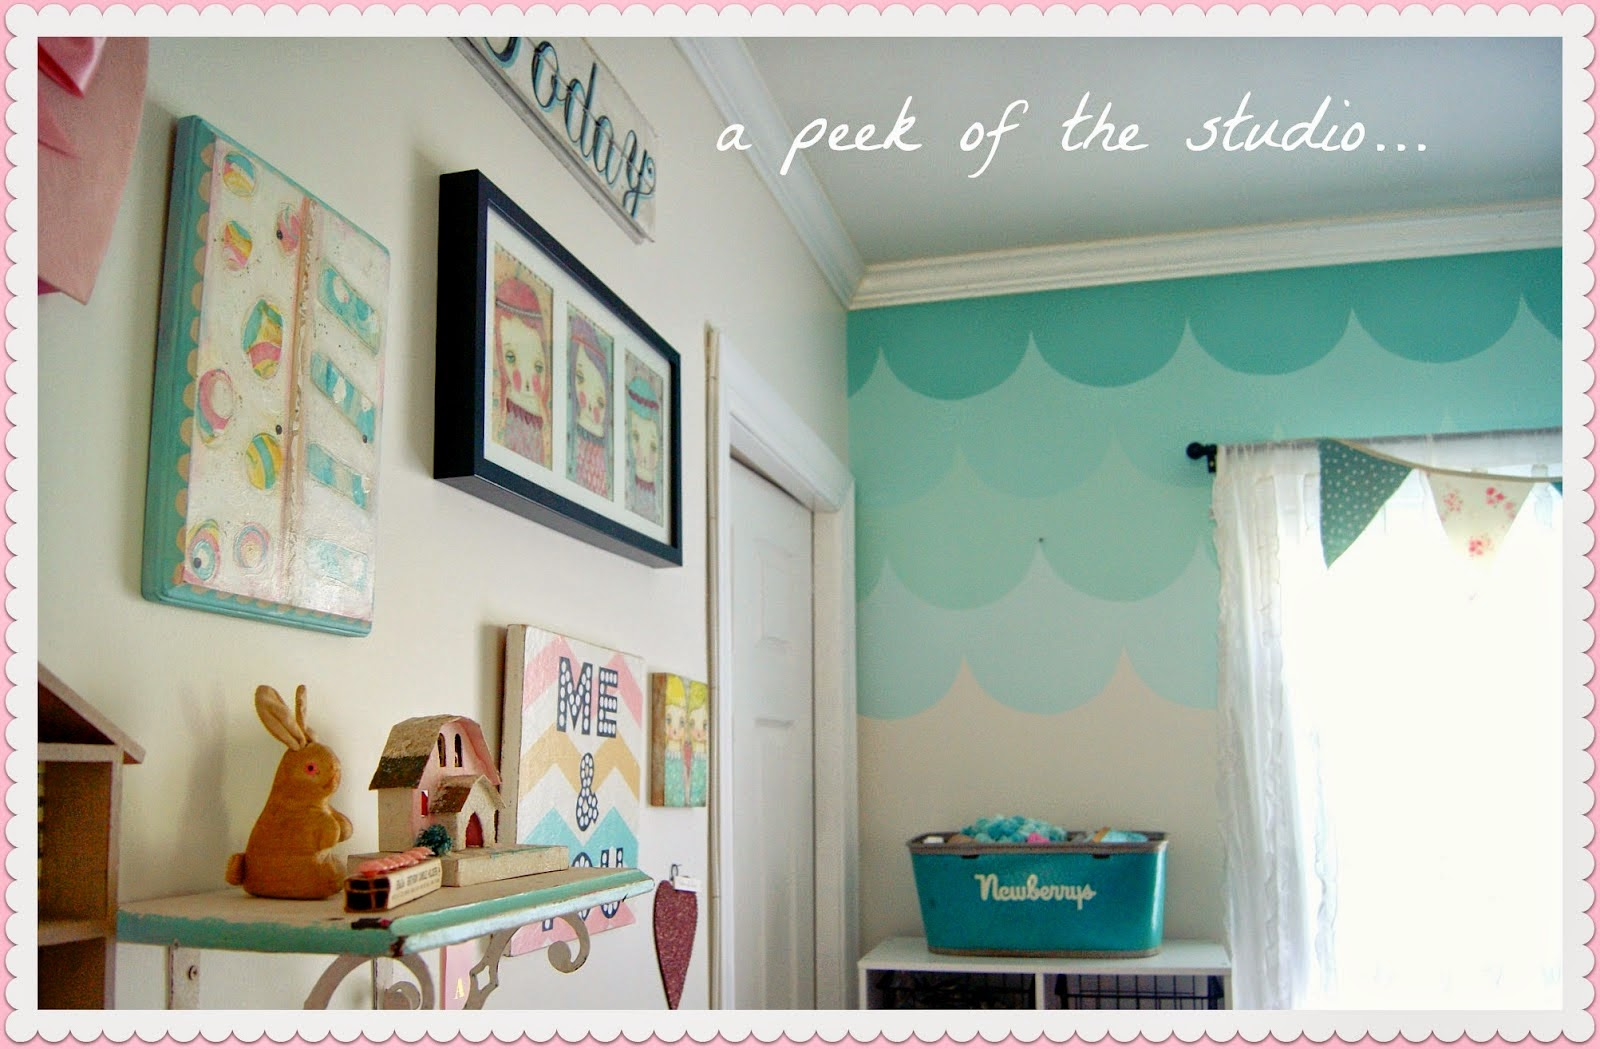 Cat Rumah Shabby - knocking on heavens door diy wall painting ombre wall